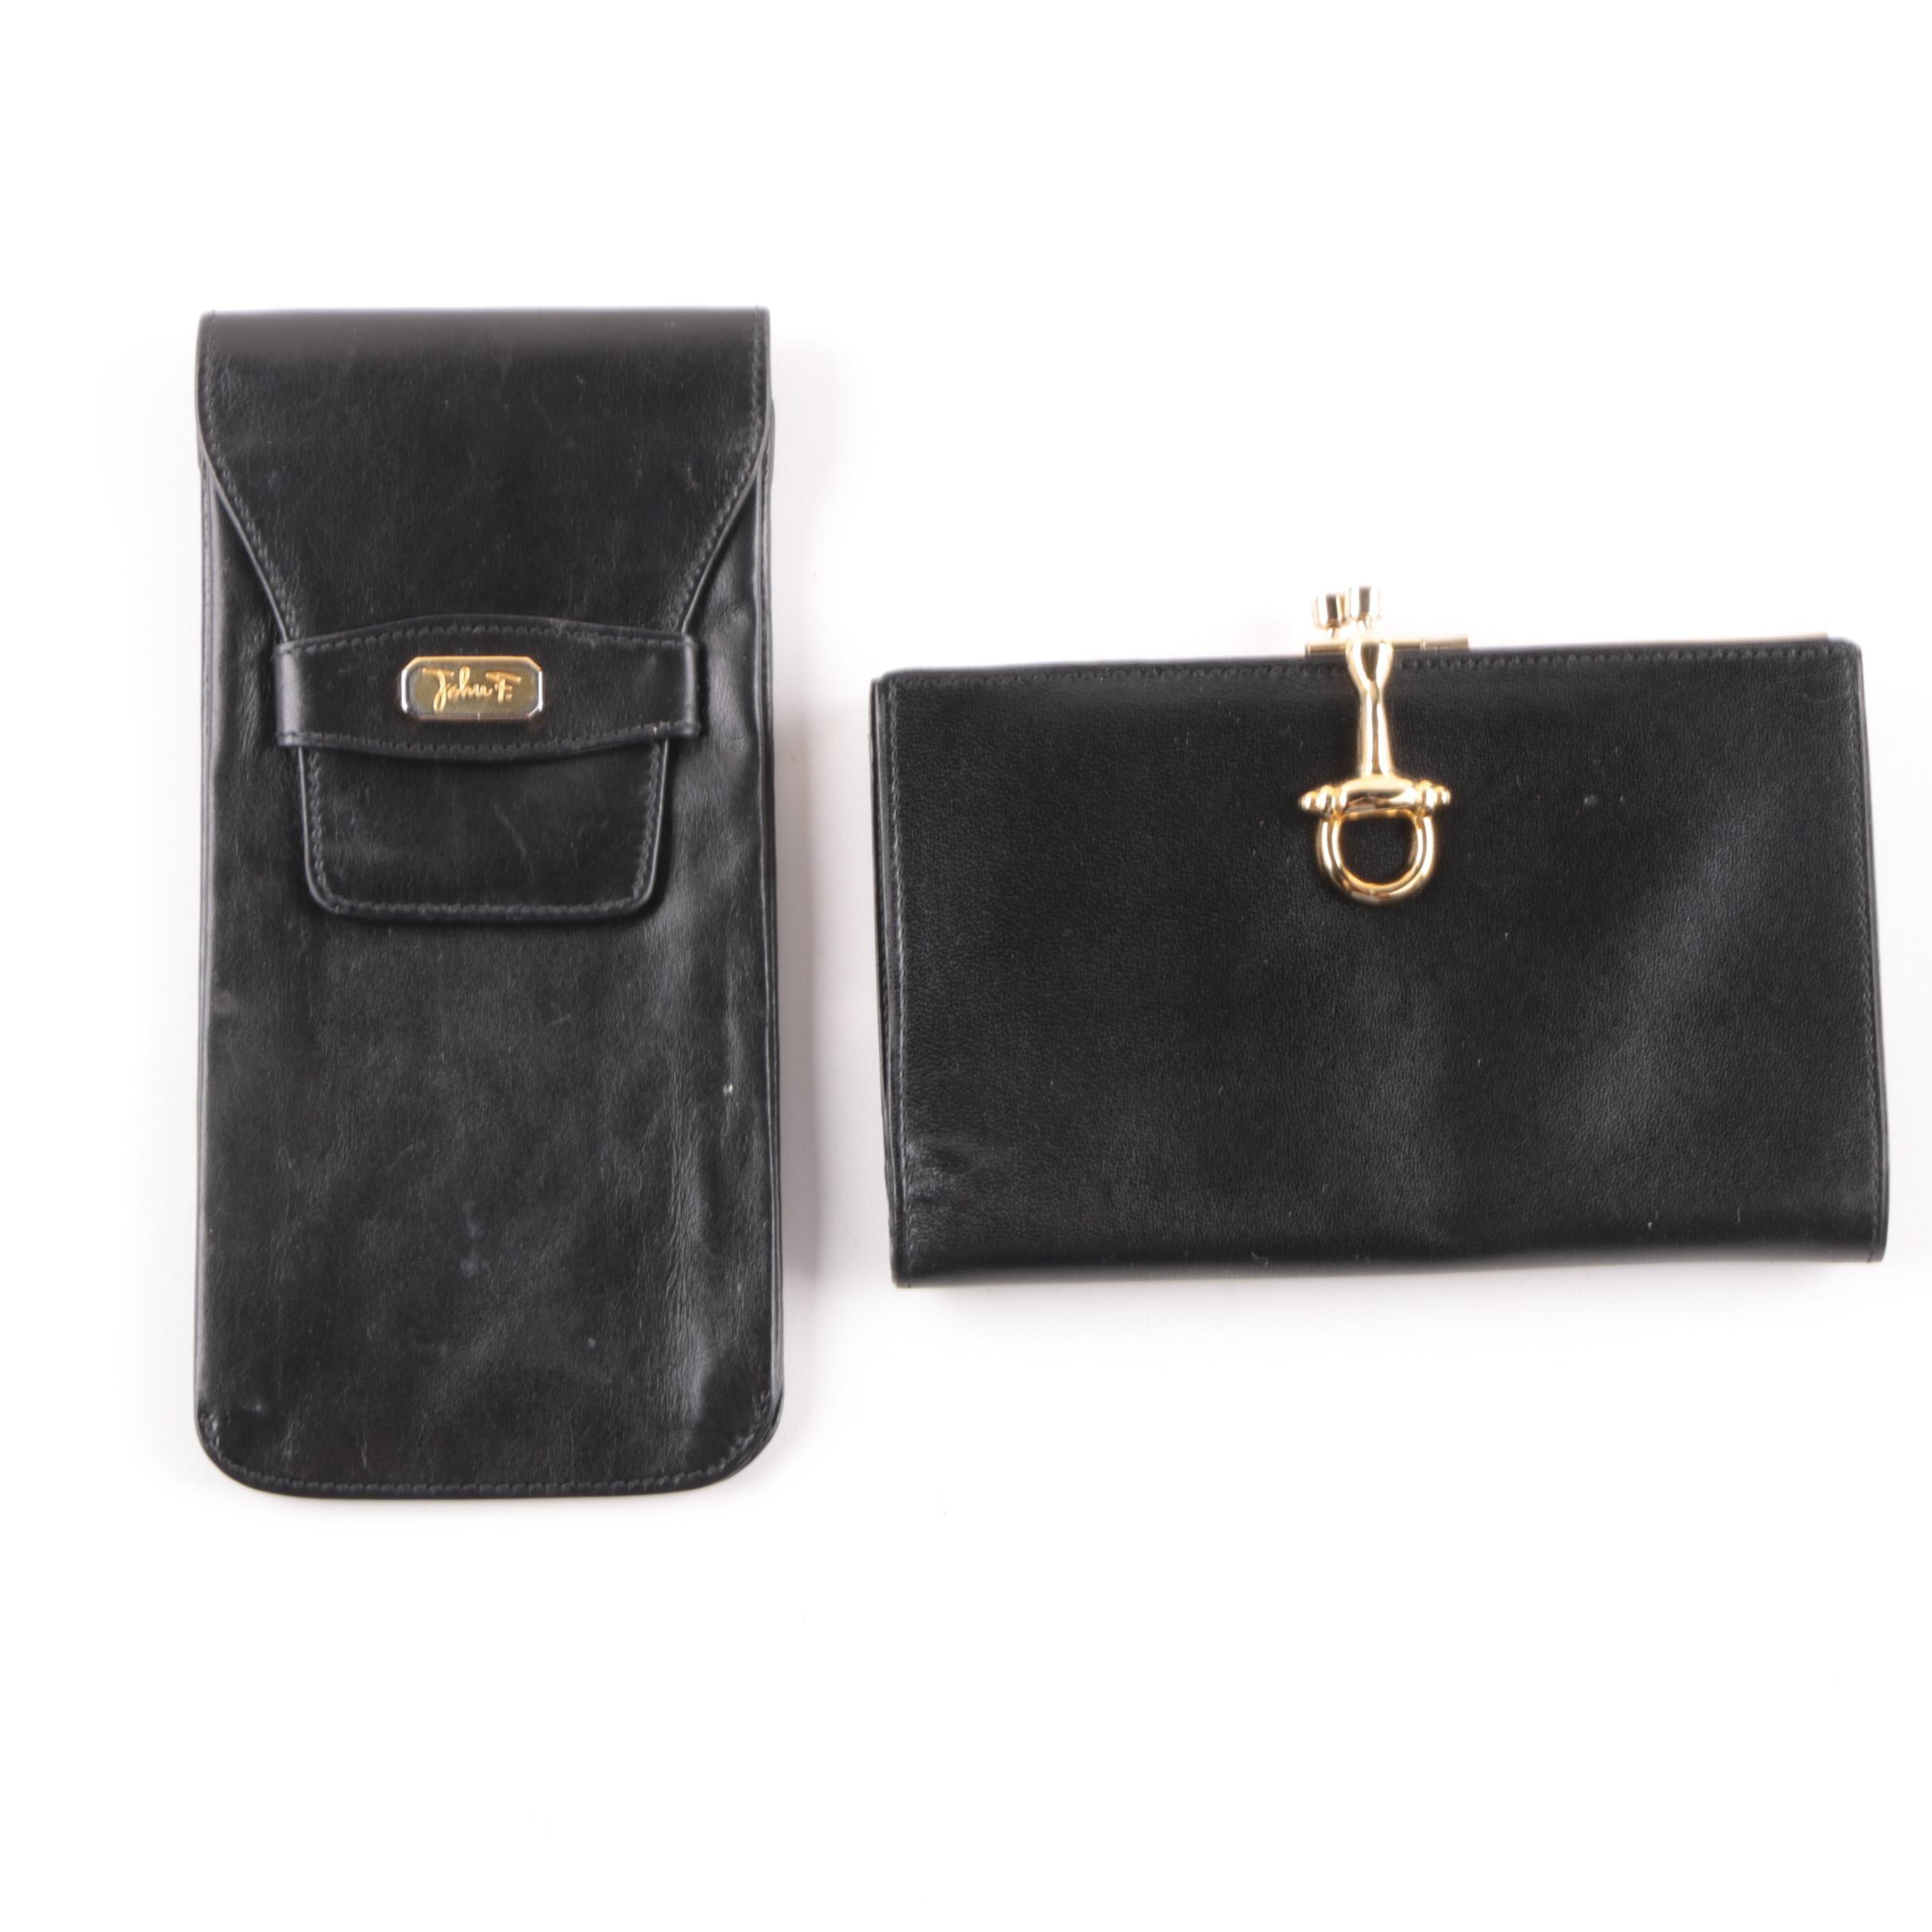 Vintage John F Italian Black Leather Wallet and Case